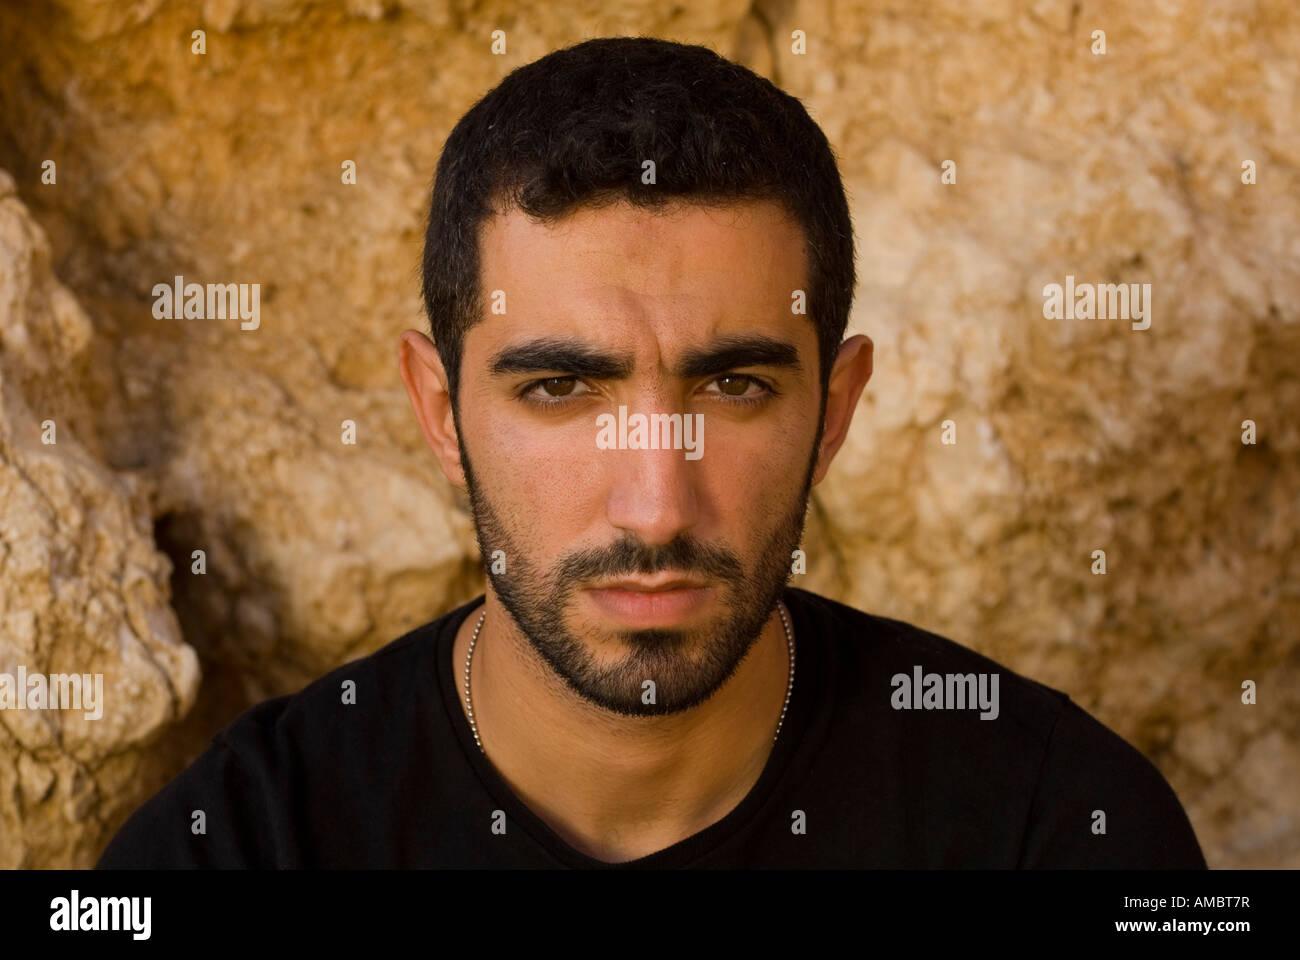 Angry Arabic Man With Beard Stock Photo 15214618 Alamy